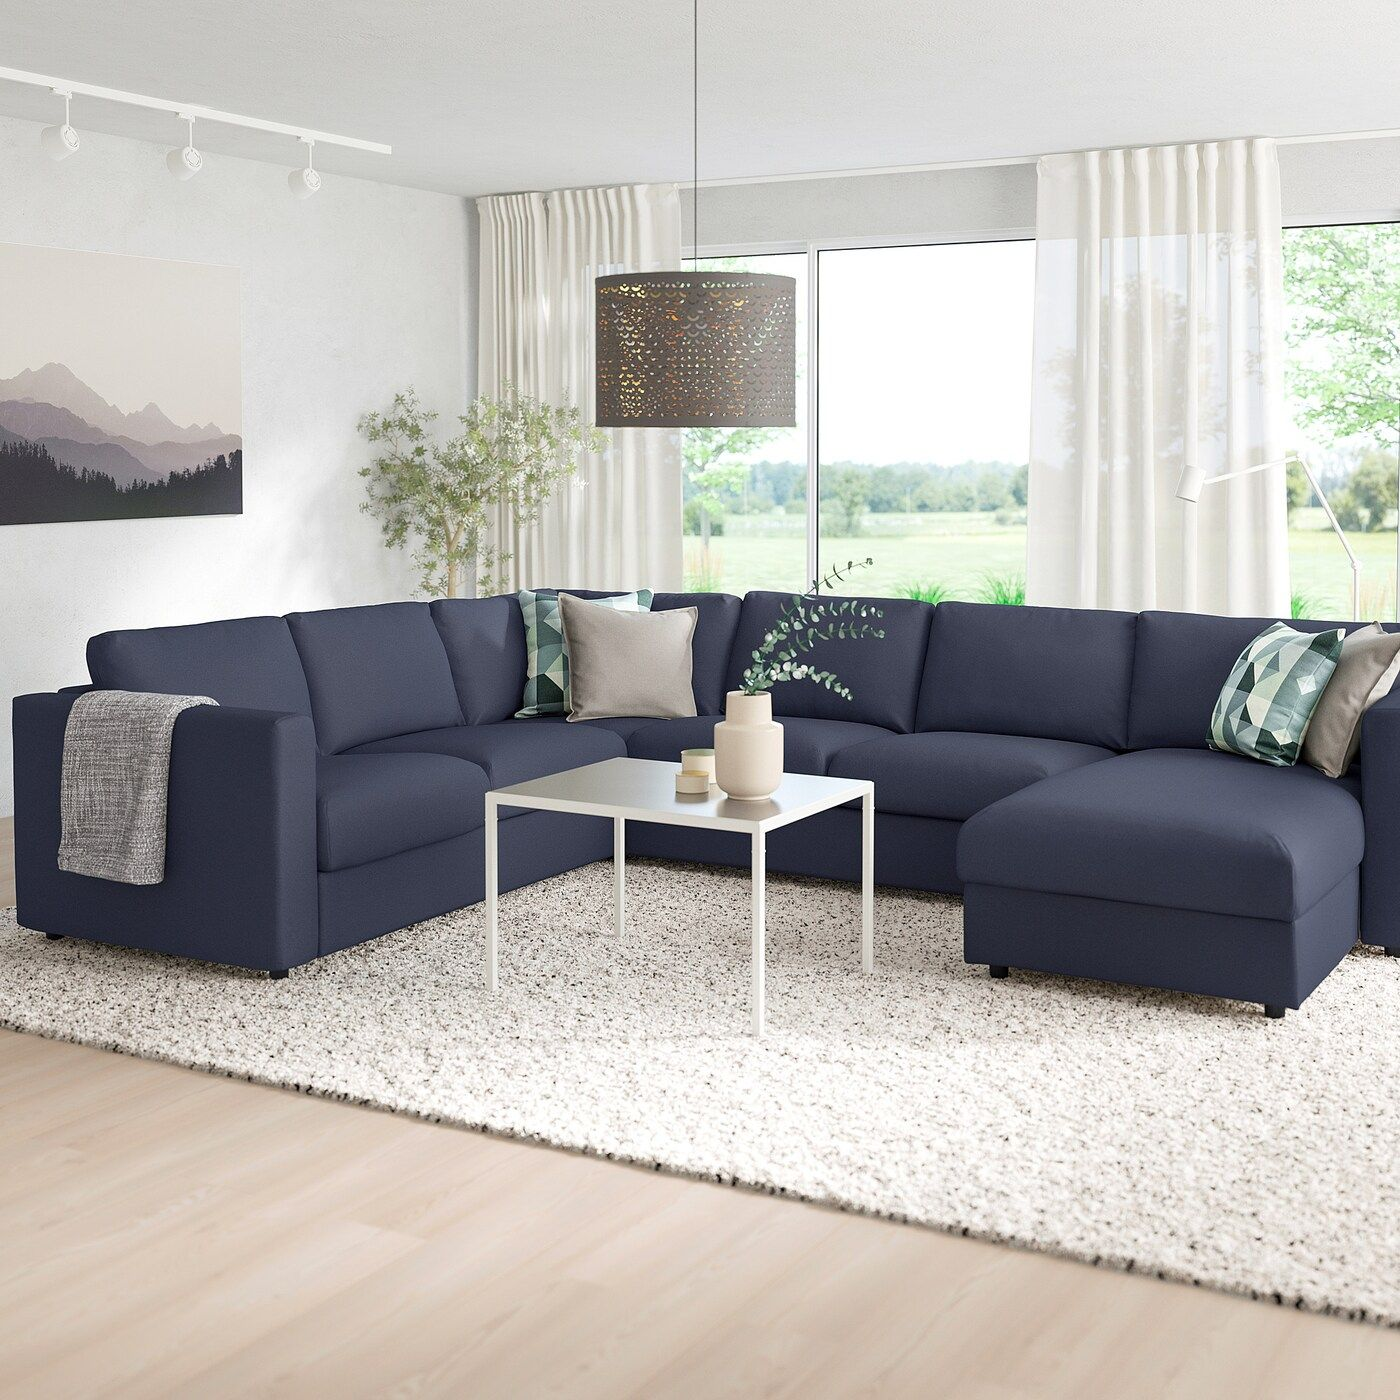 Vimle 5er Eckbettsofa Mit Recamiere Orrsta Schwarzblau Ikea Osterreich In 2020 U Formiges Sofa Recamiere Sofa